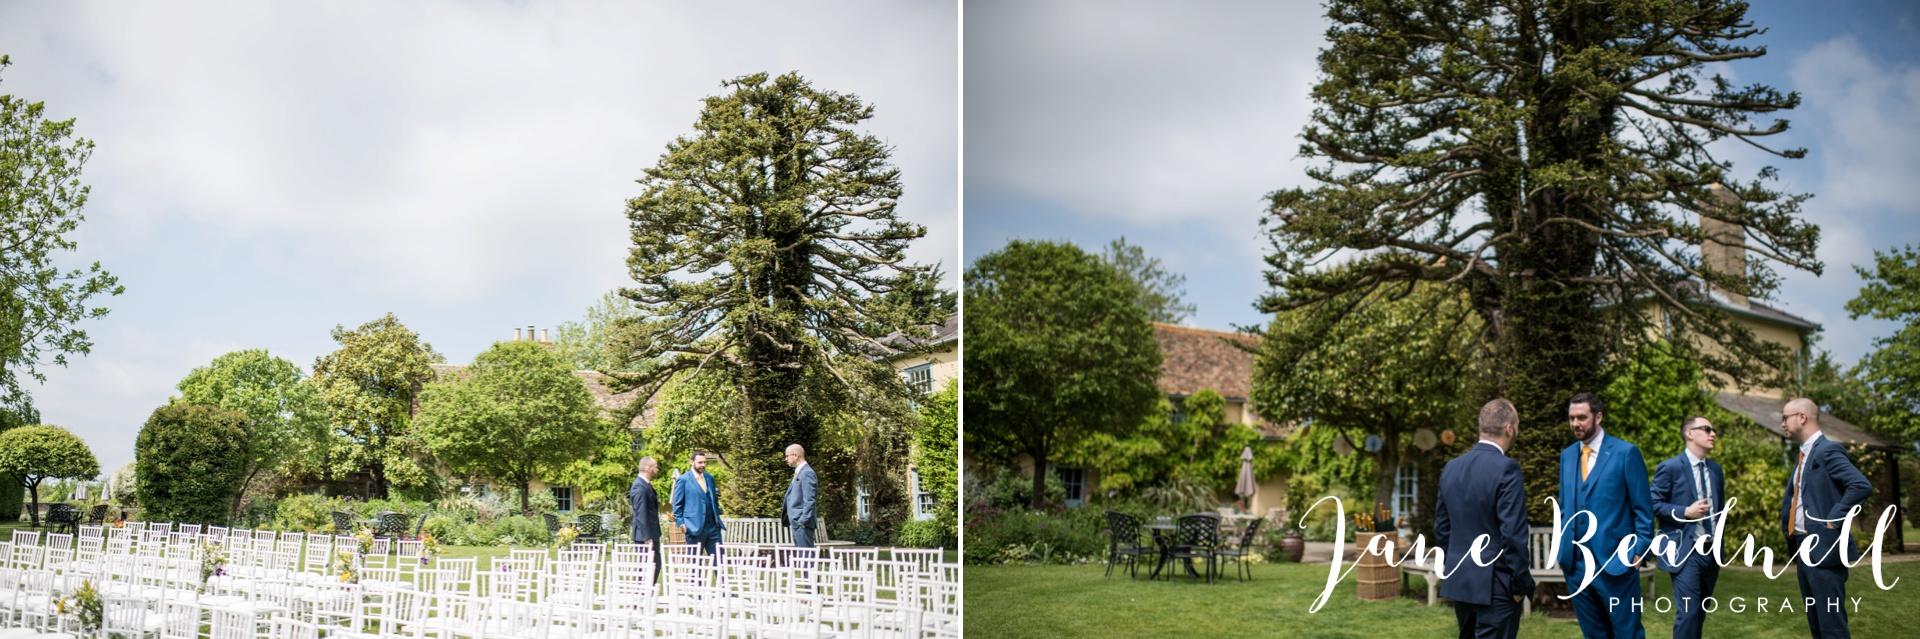 South Farm Wedding photography Hertfordshire by Jane Beadnell Photography fine art wedding photographer_0037